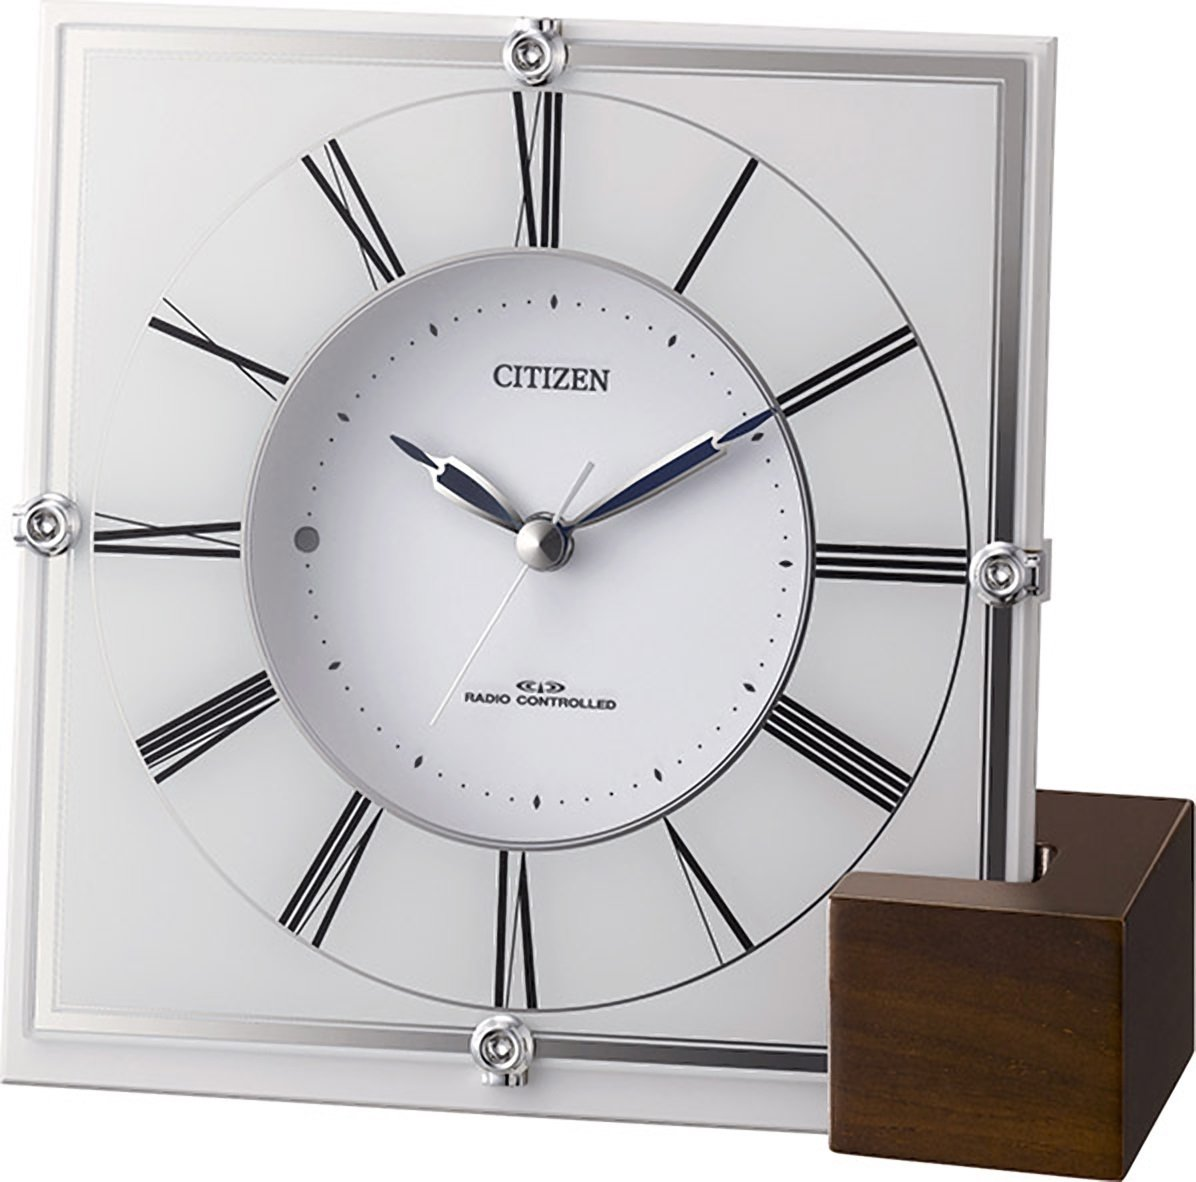 CITIZEN ( シチズン ) 電波 置き時計 マリアージュ707 プラスチック枠 / 木製台座 4RY707-003 B00GXT1R0E